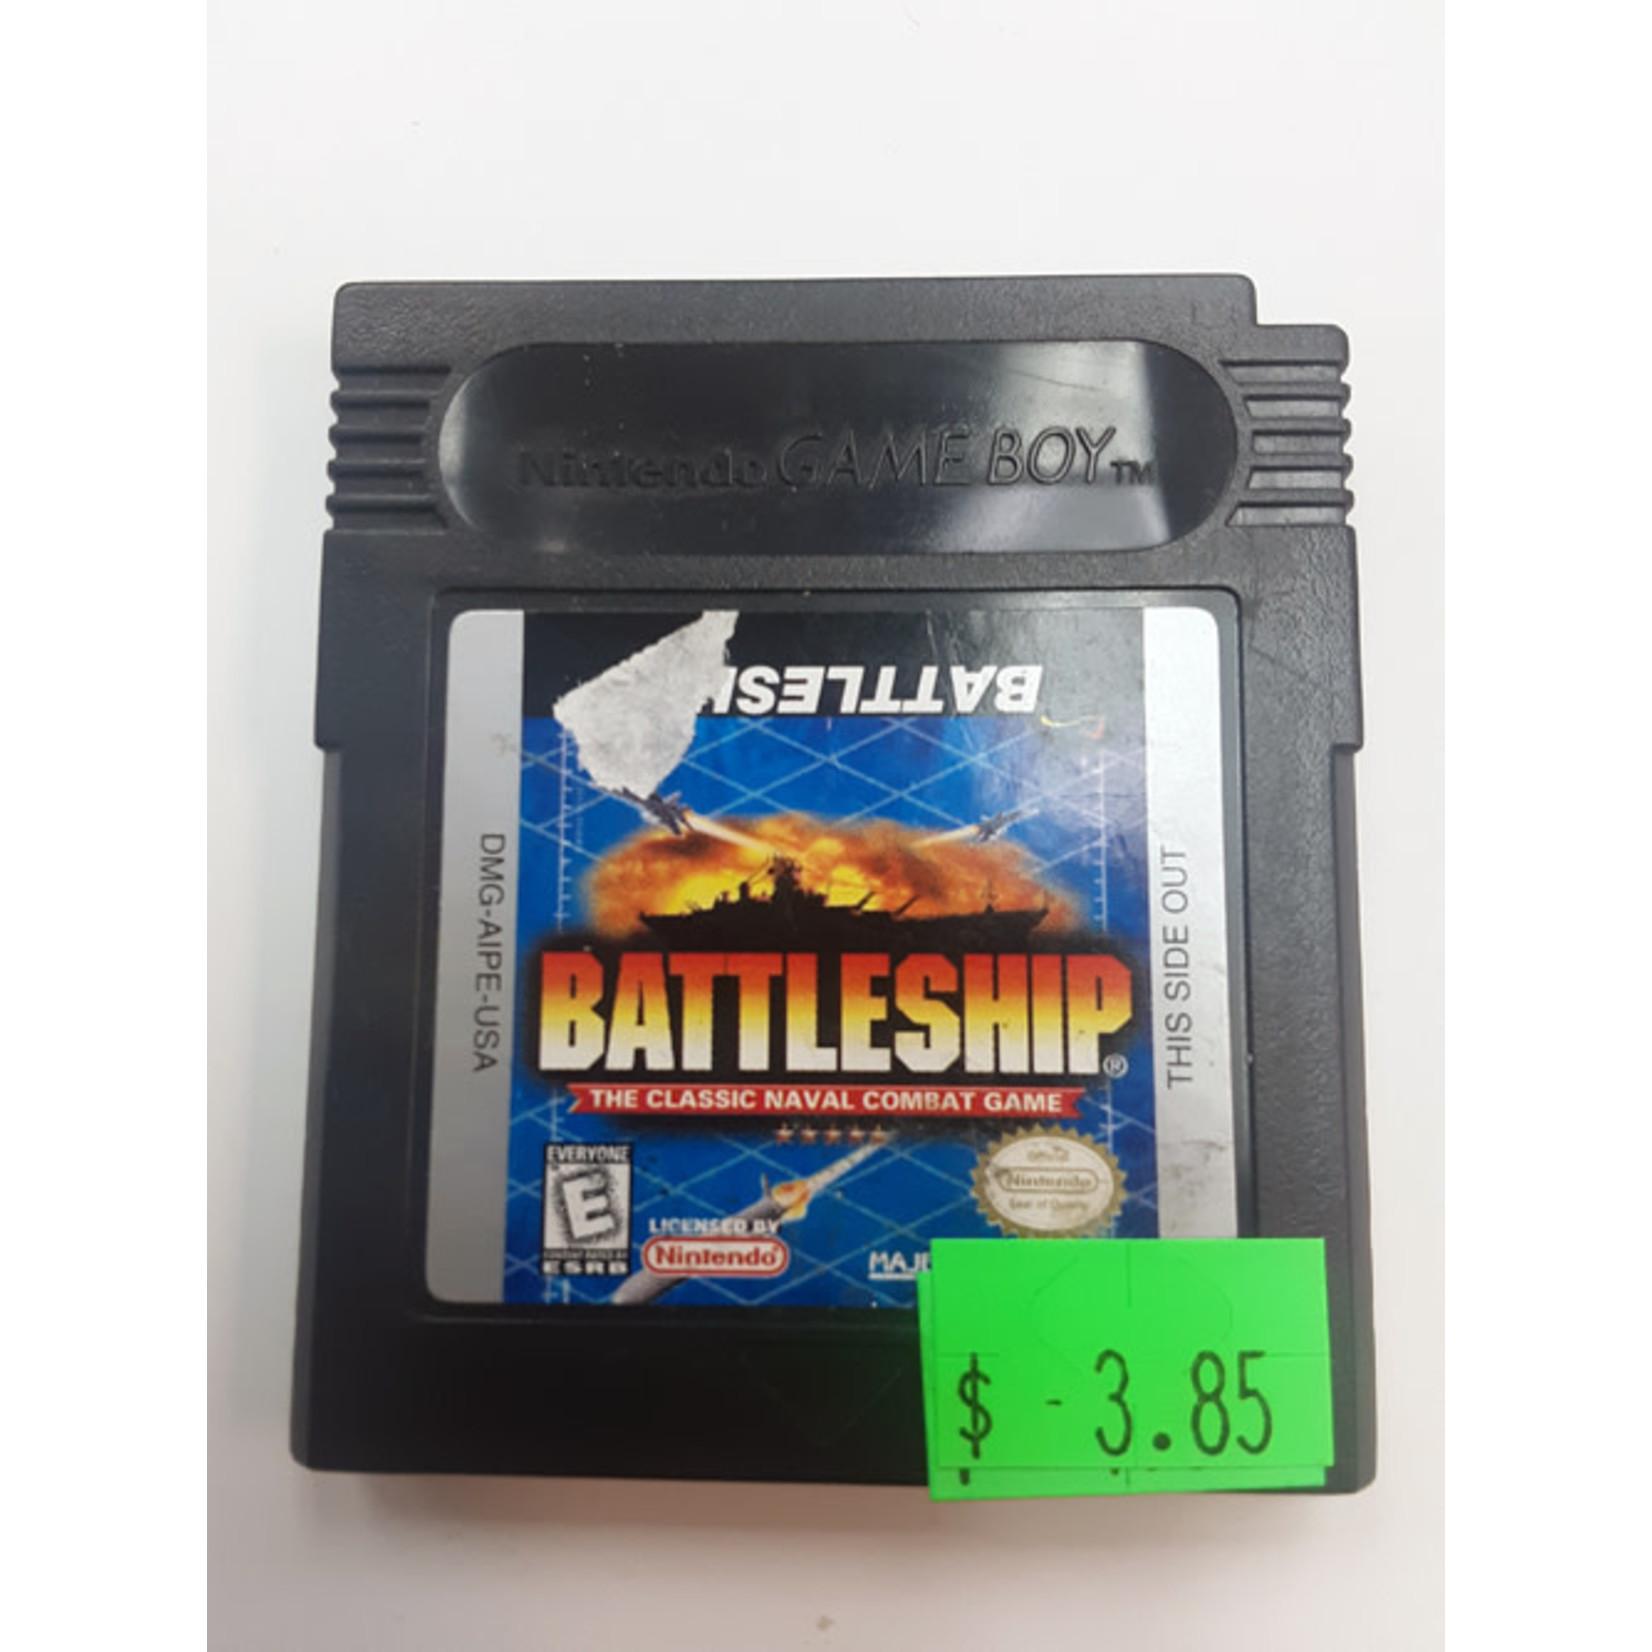 GBCu-Battleship (cartridge)